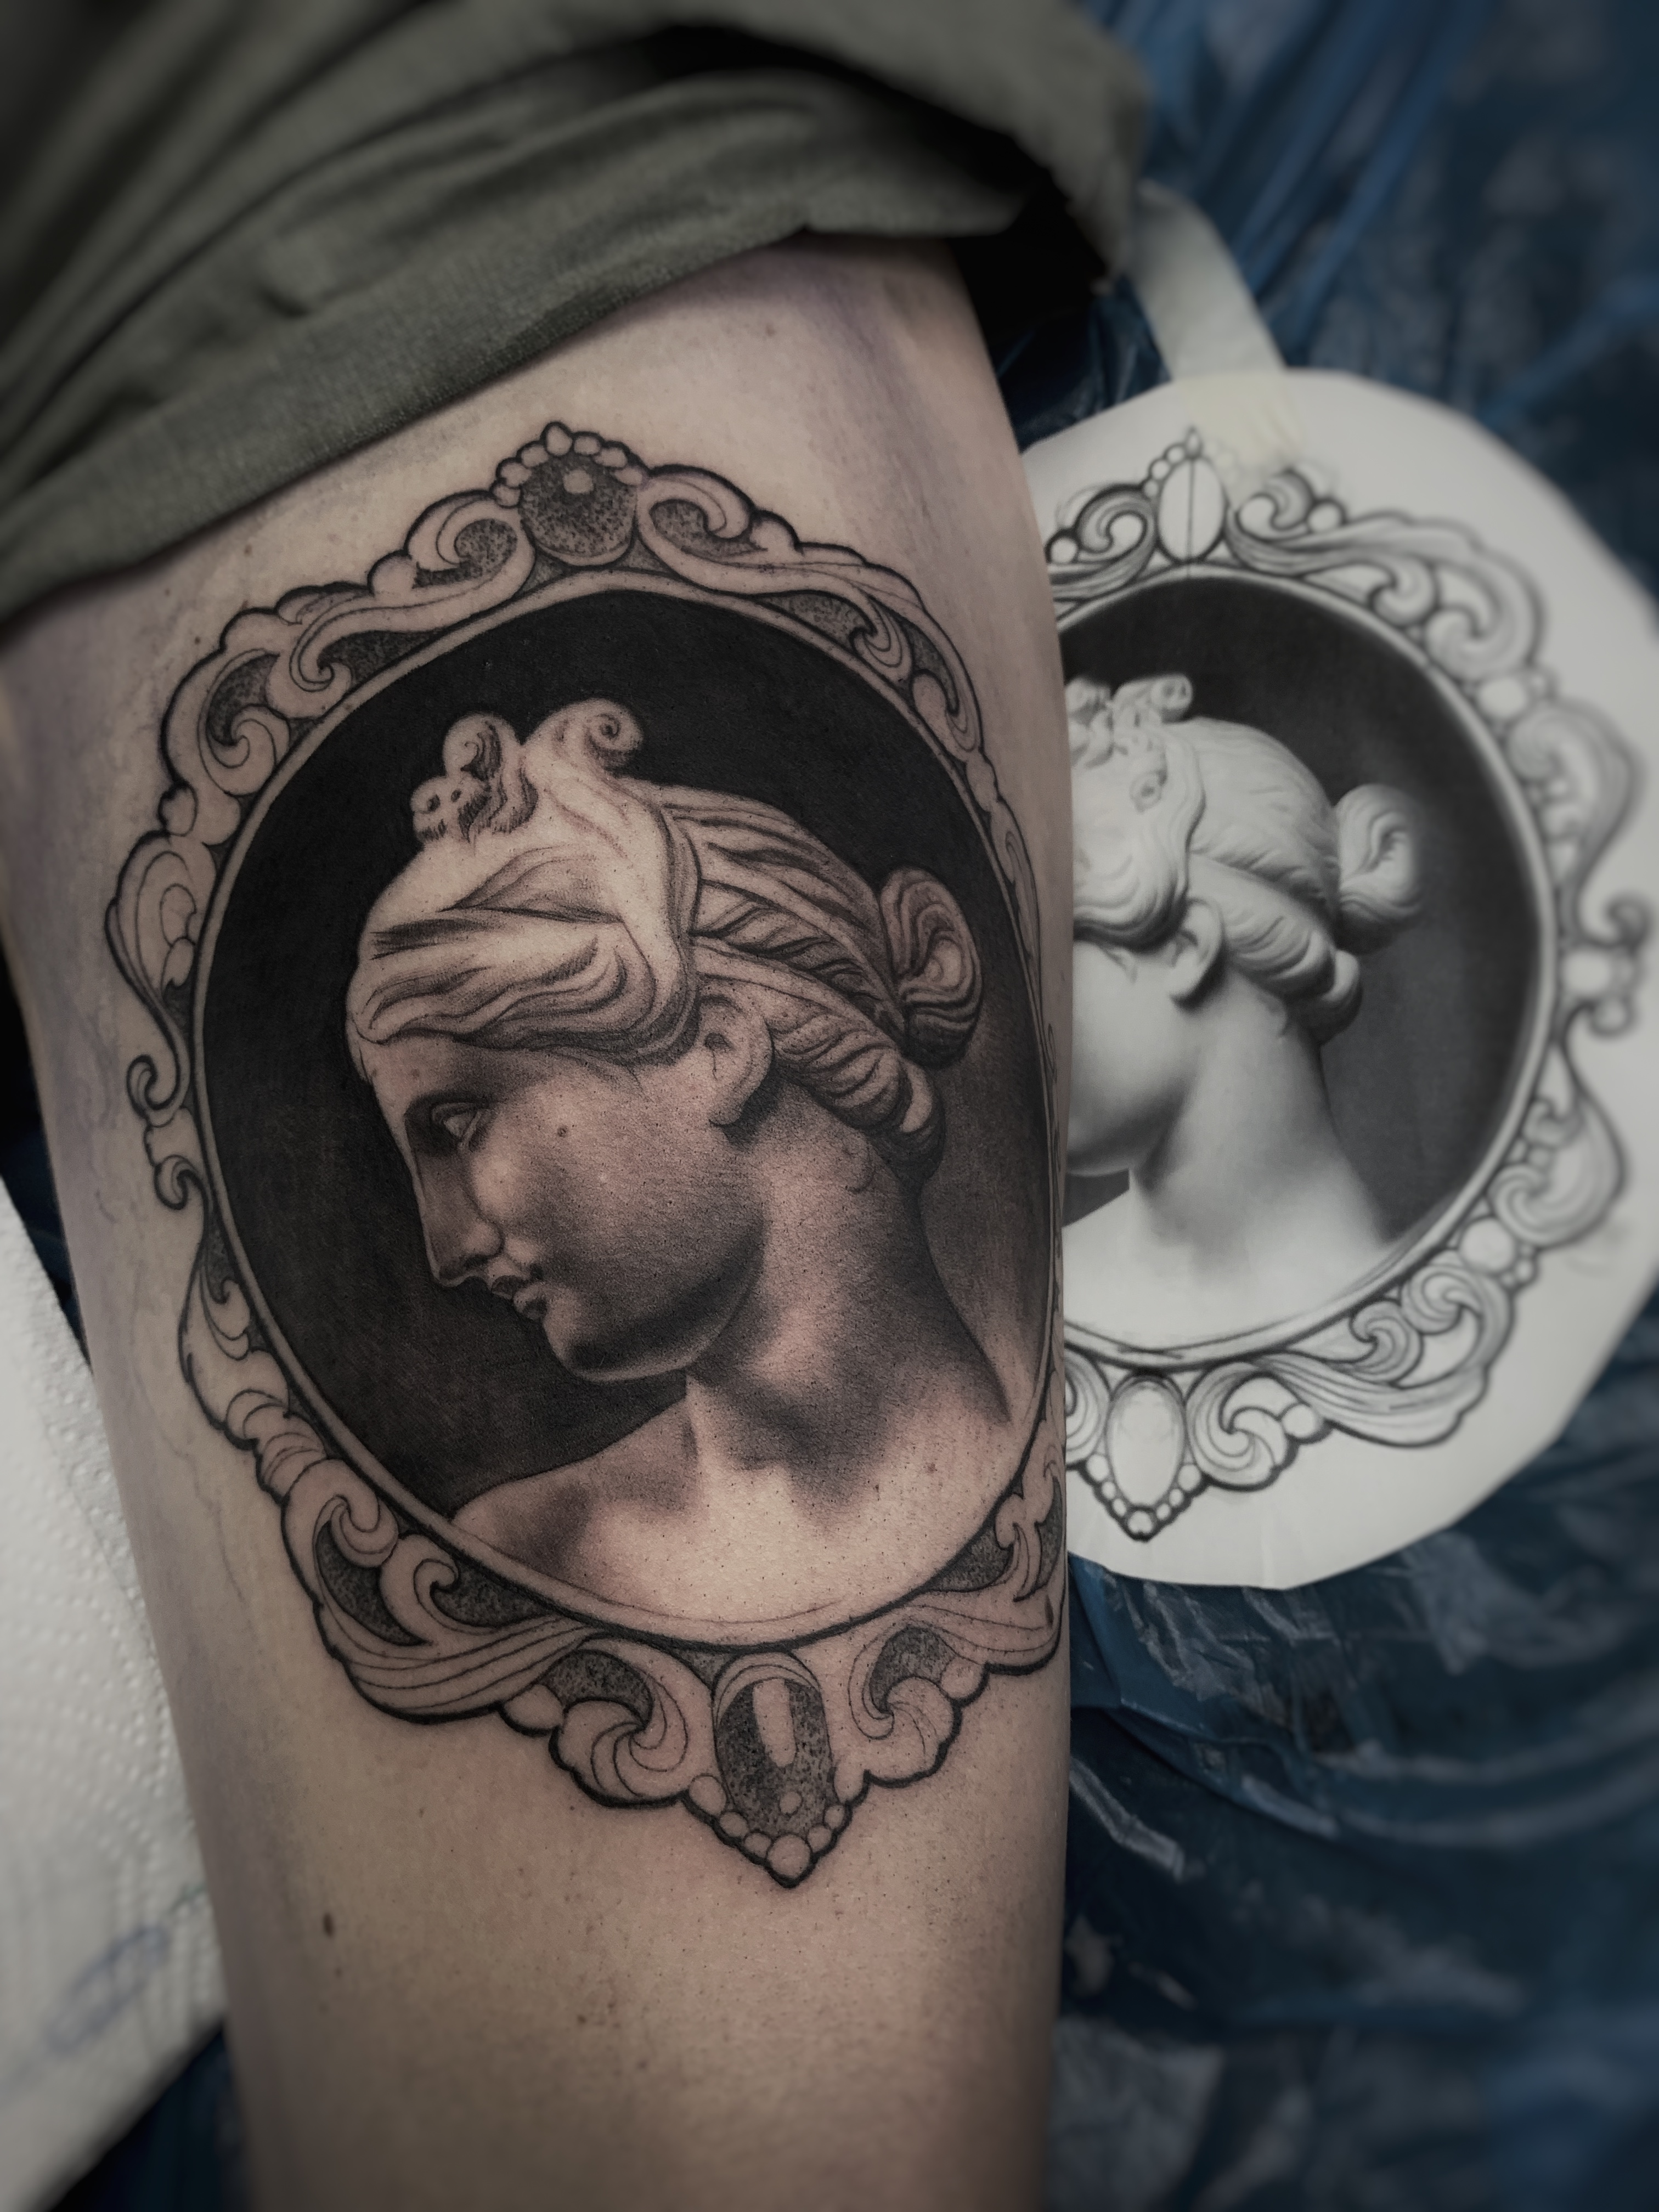 tattoo_dresden dresden ink inked tattoo_leipzig leipzig berlin